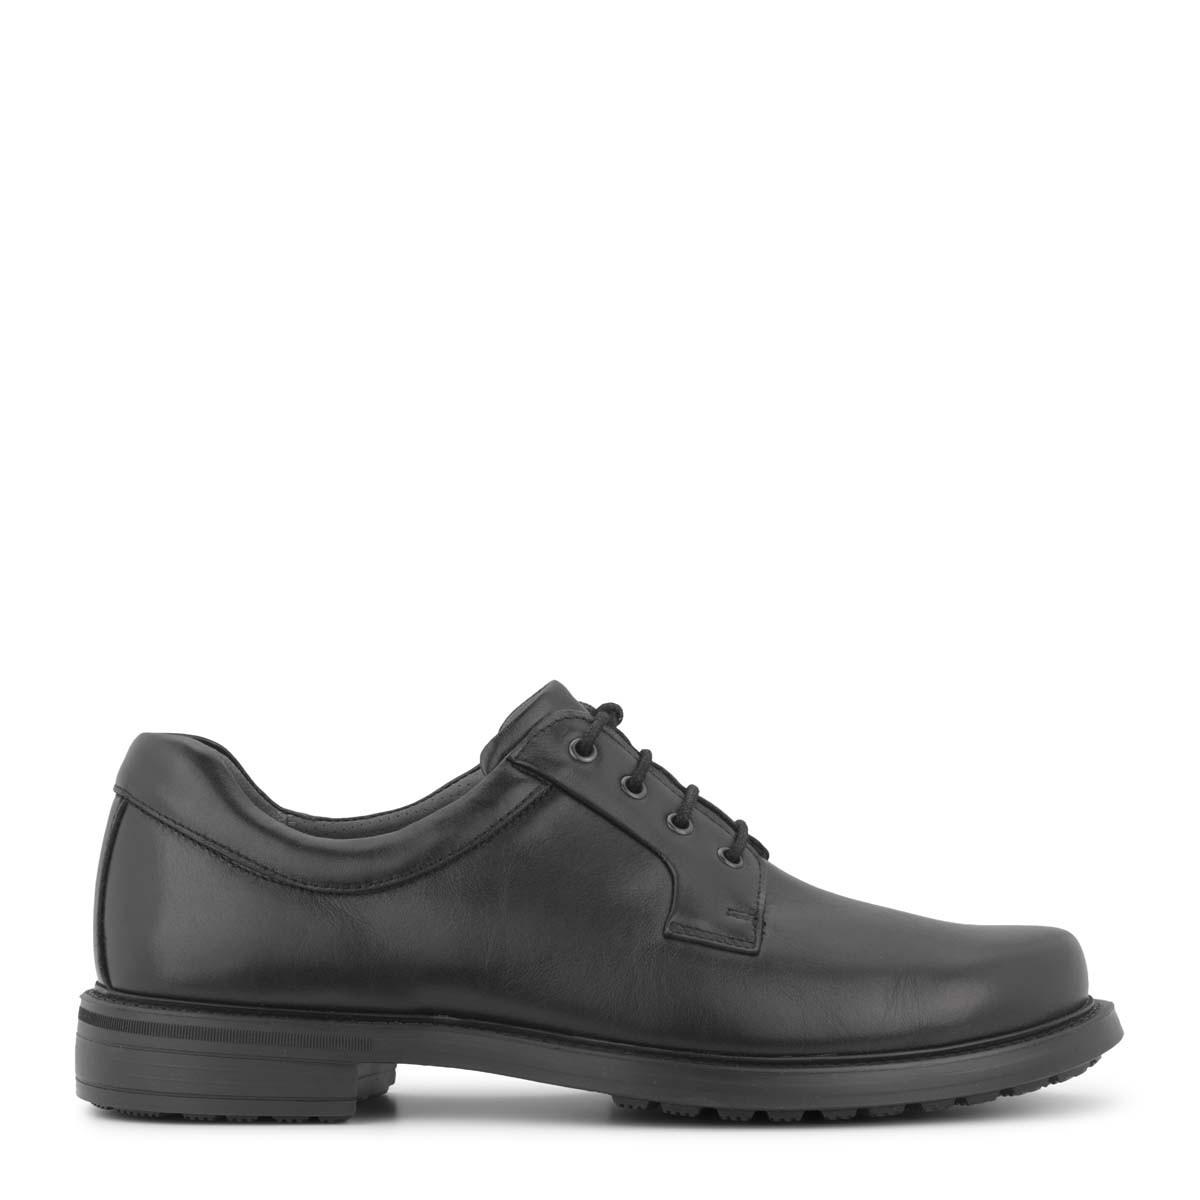 Image of   New Feet klassisk herresko med fri hæl